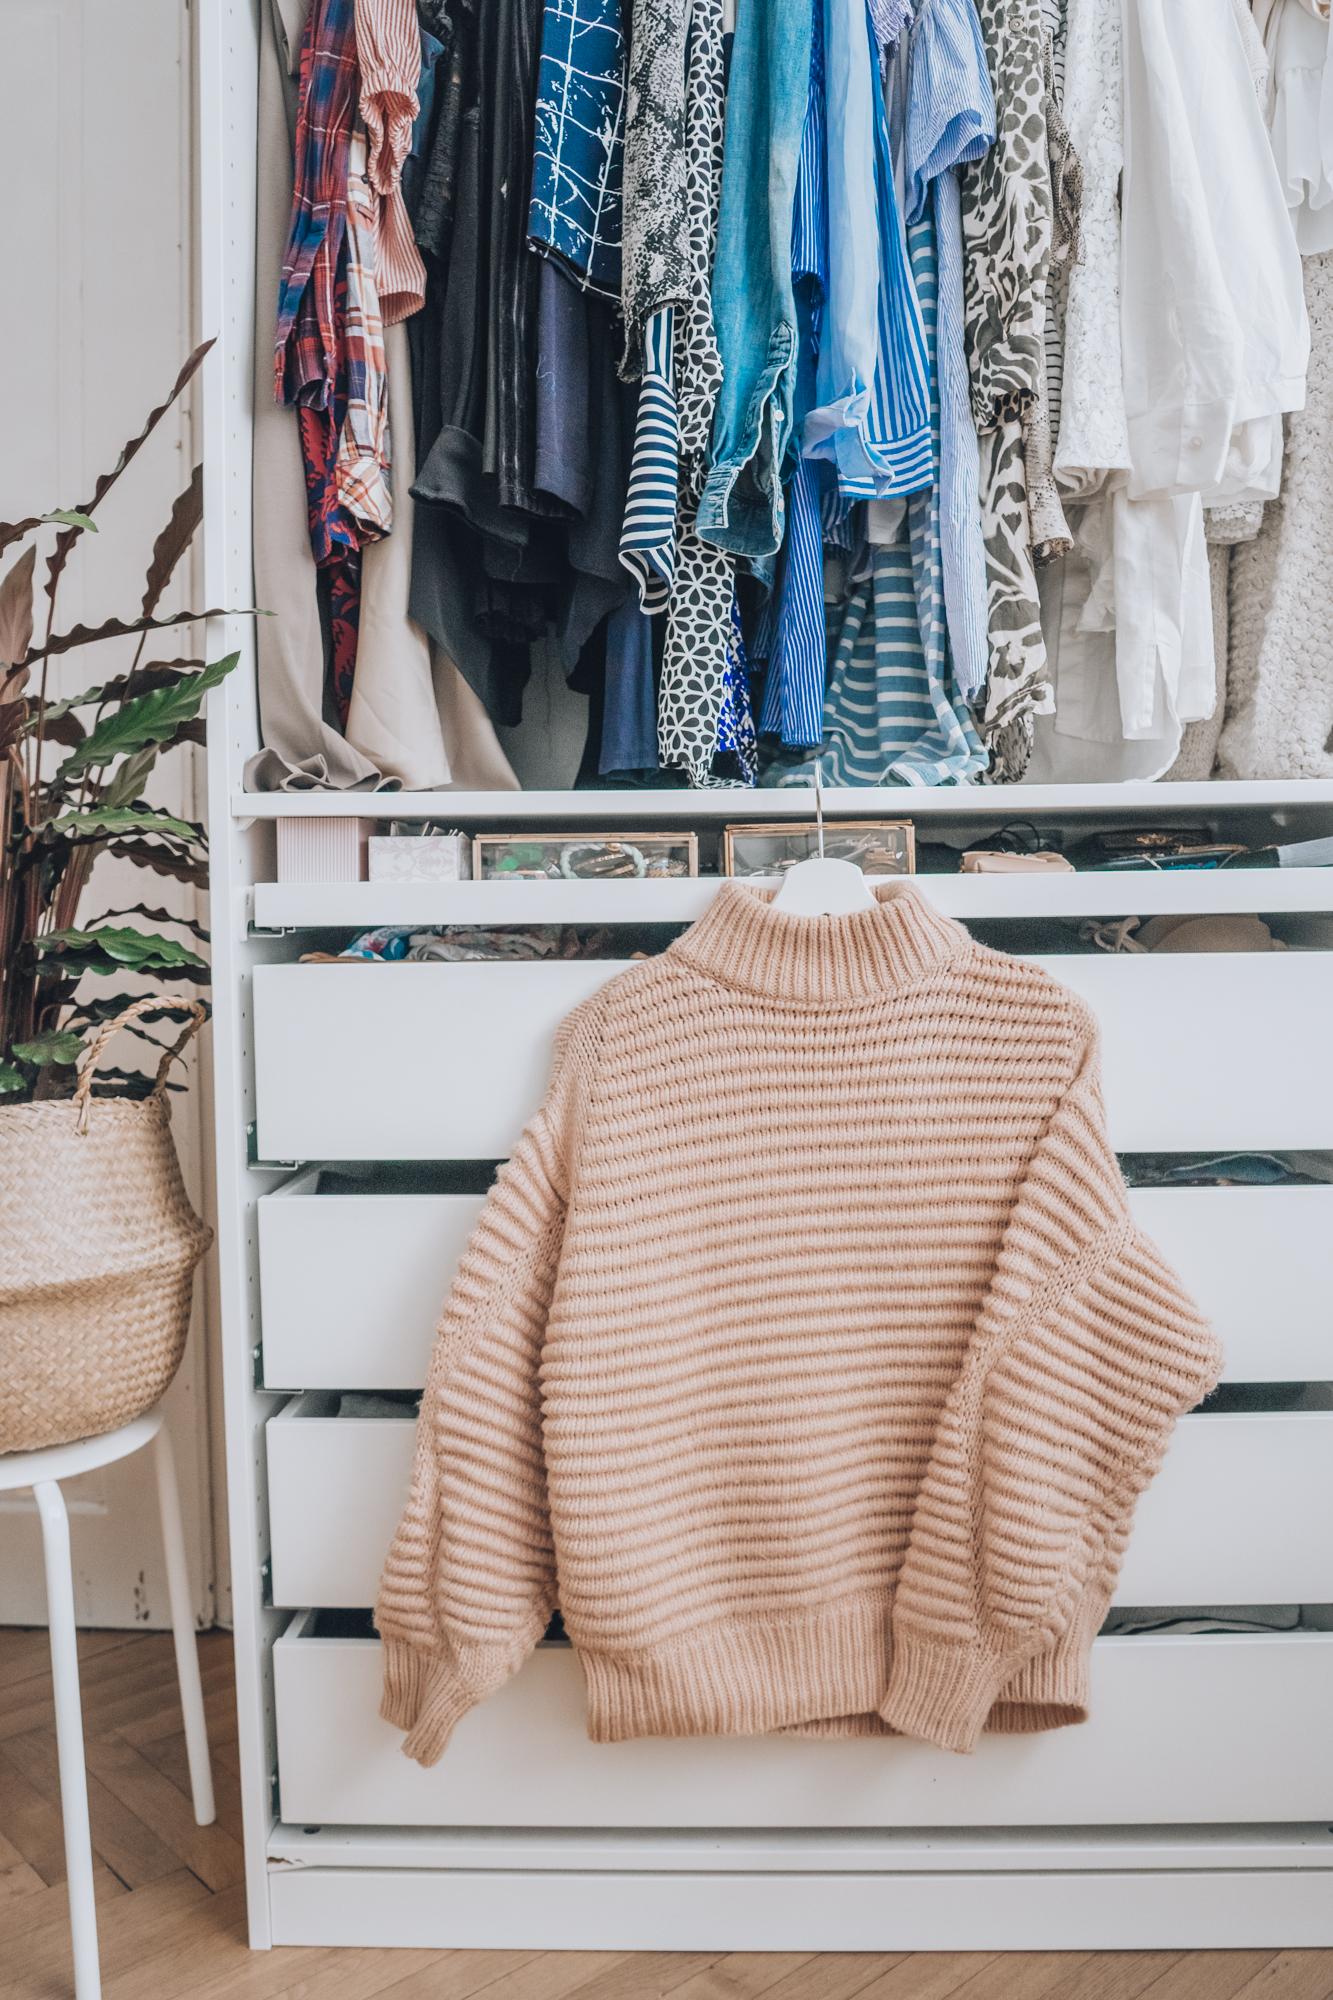 Closet Organization Tips Decluttering Organizing Kleiderschrank Primetime Chaos